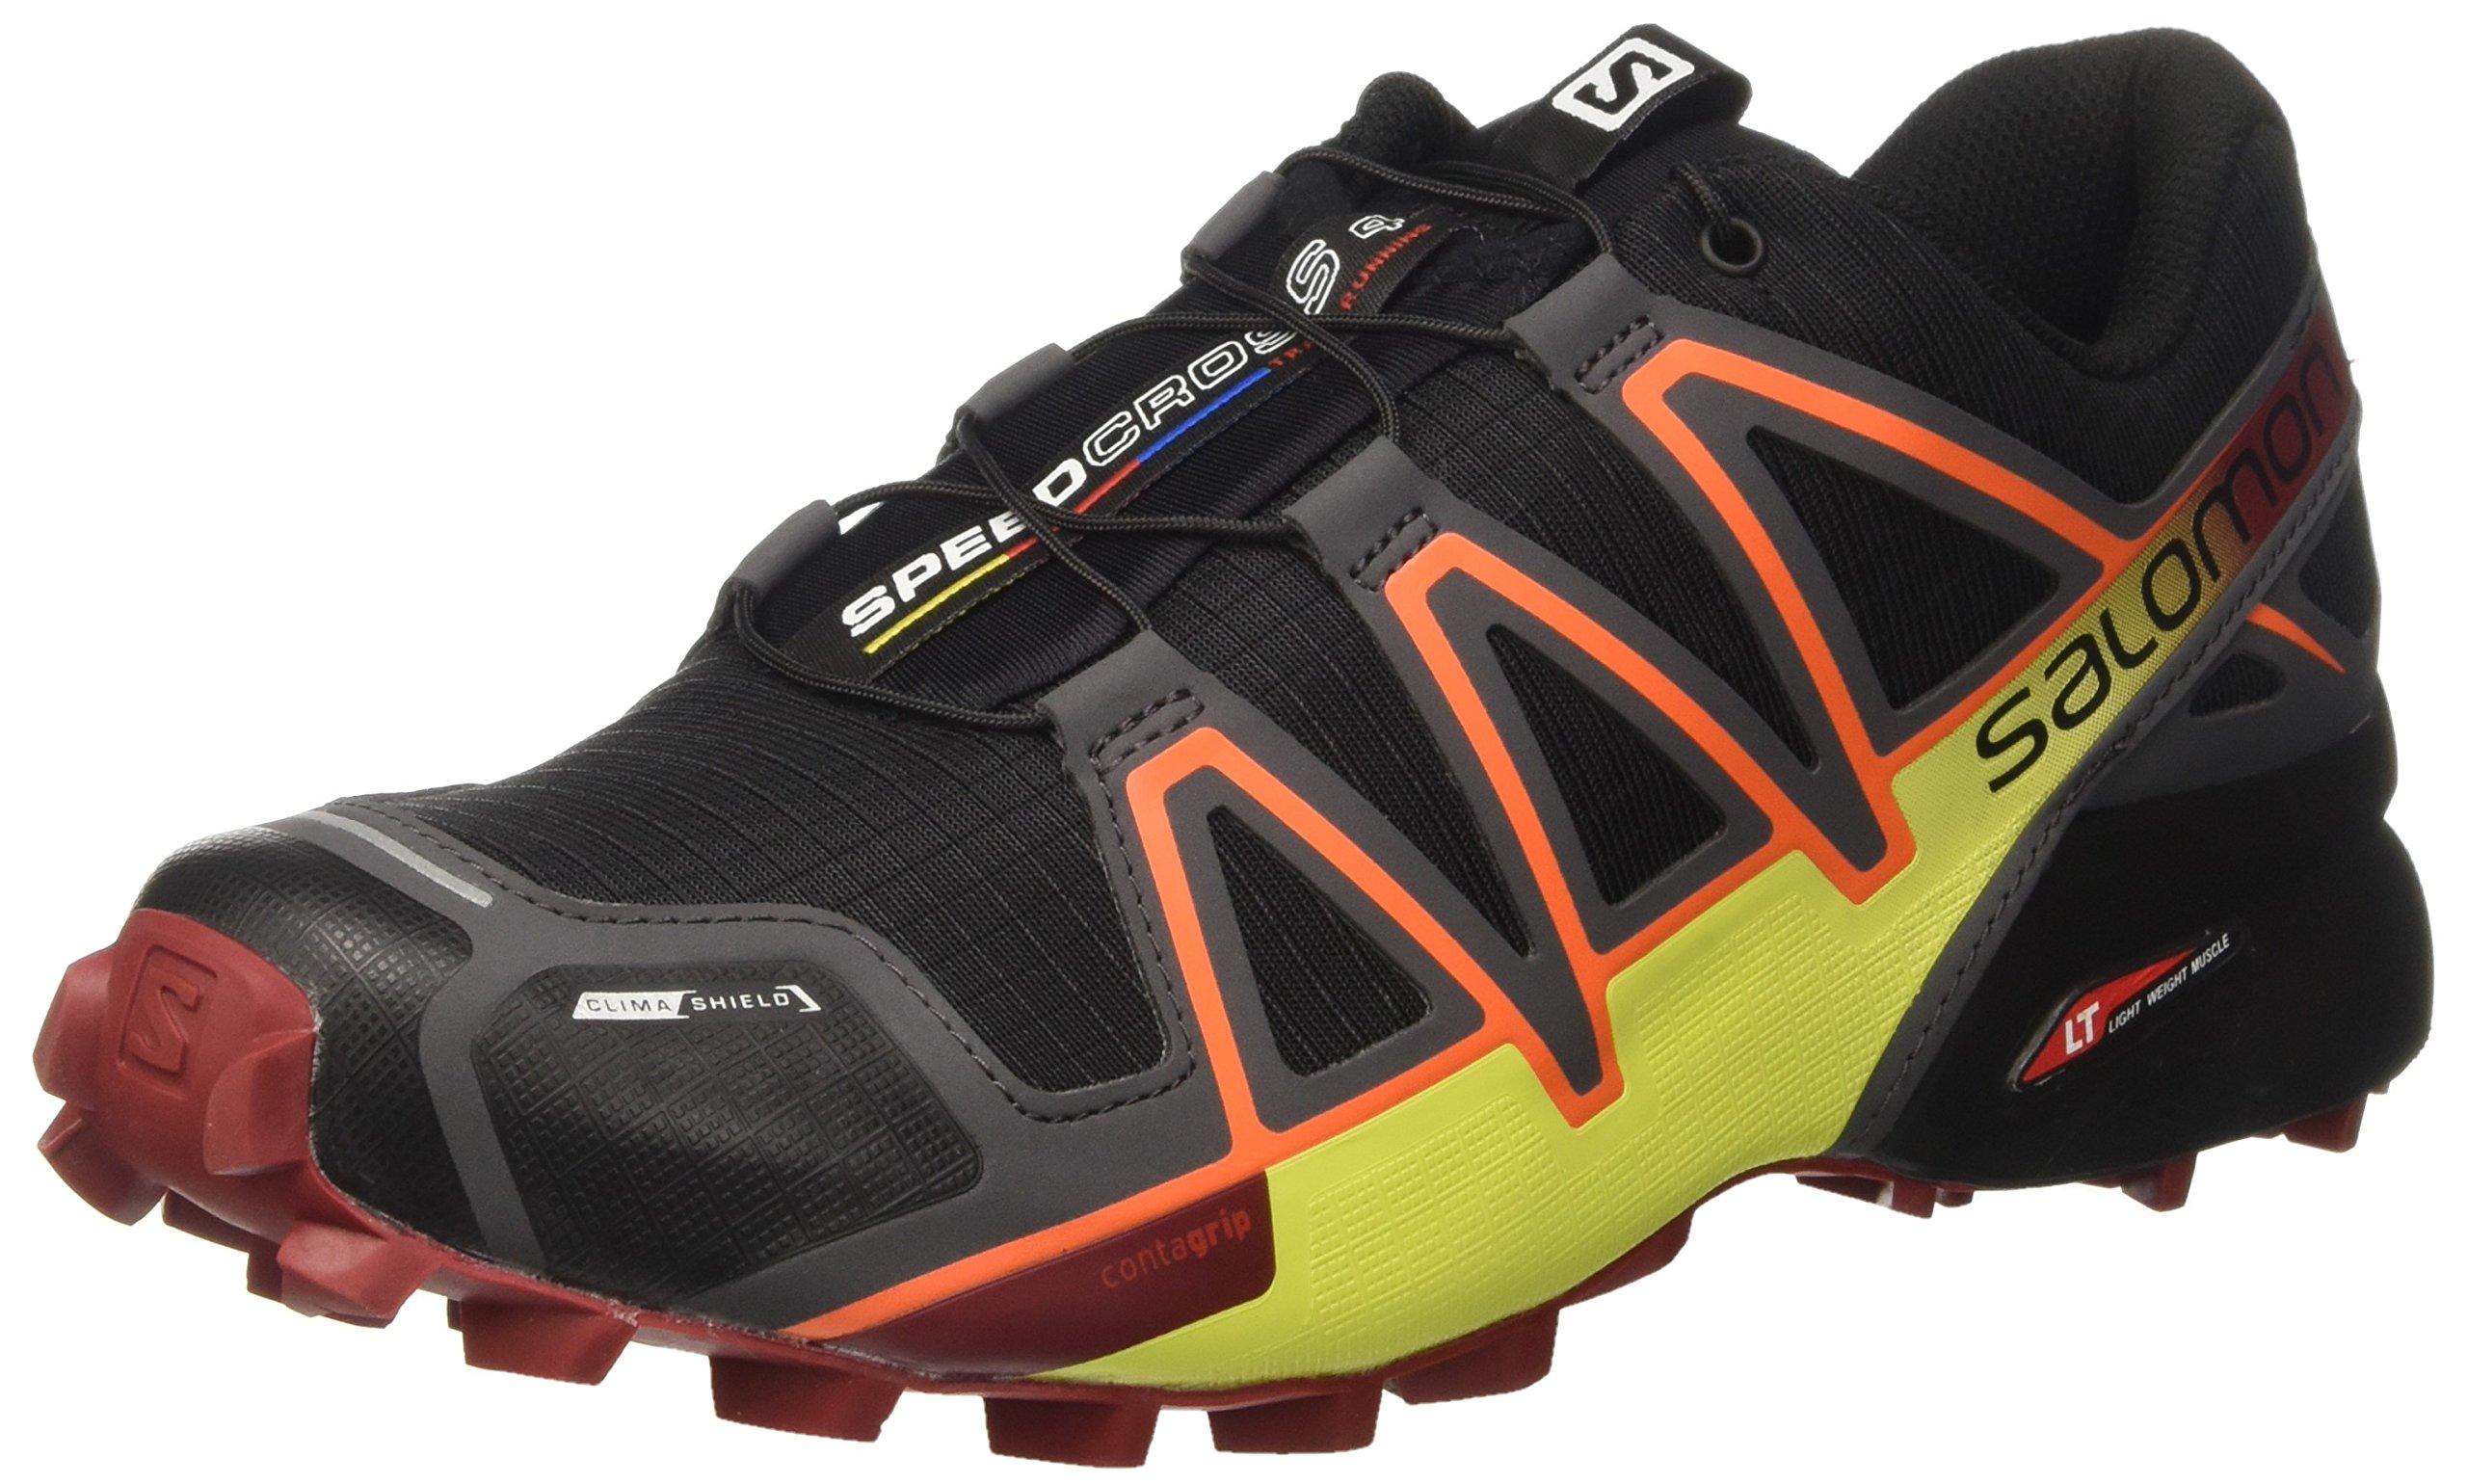 Salomon Men's XA Pro 3D Trail Running Shoes, Black/Magnet/Red Dahlia, 9 D US